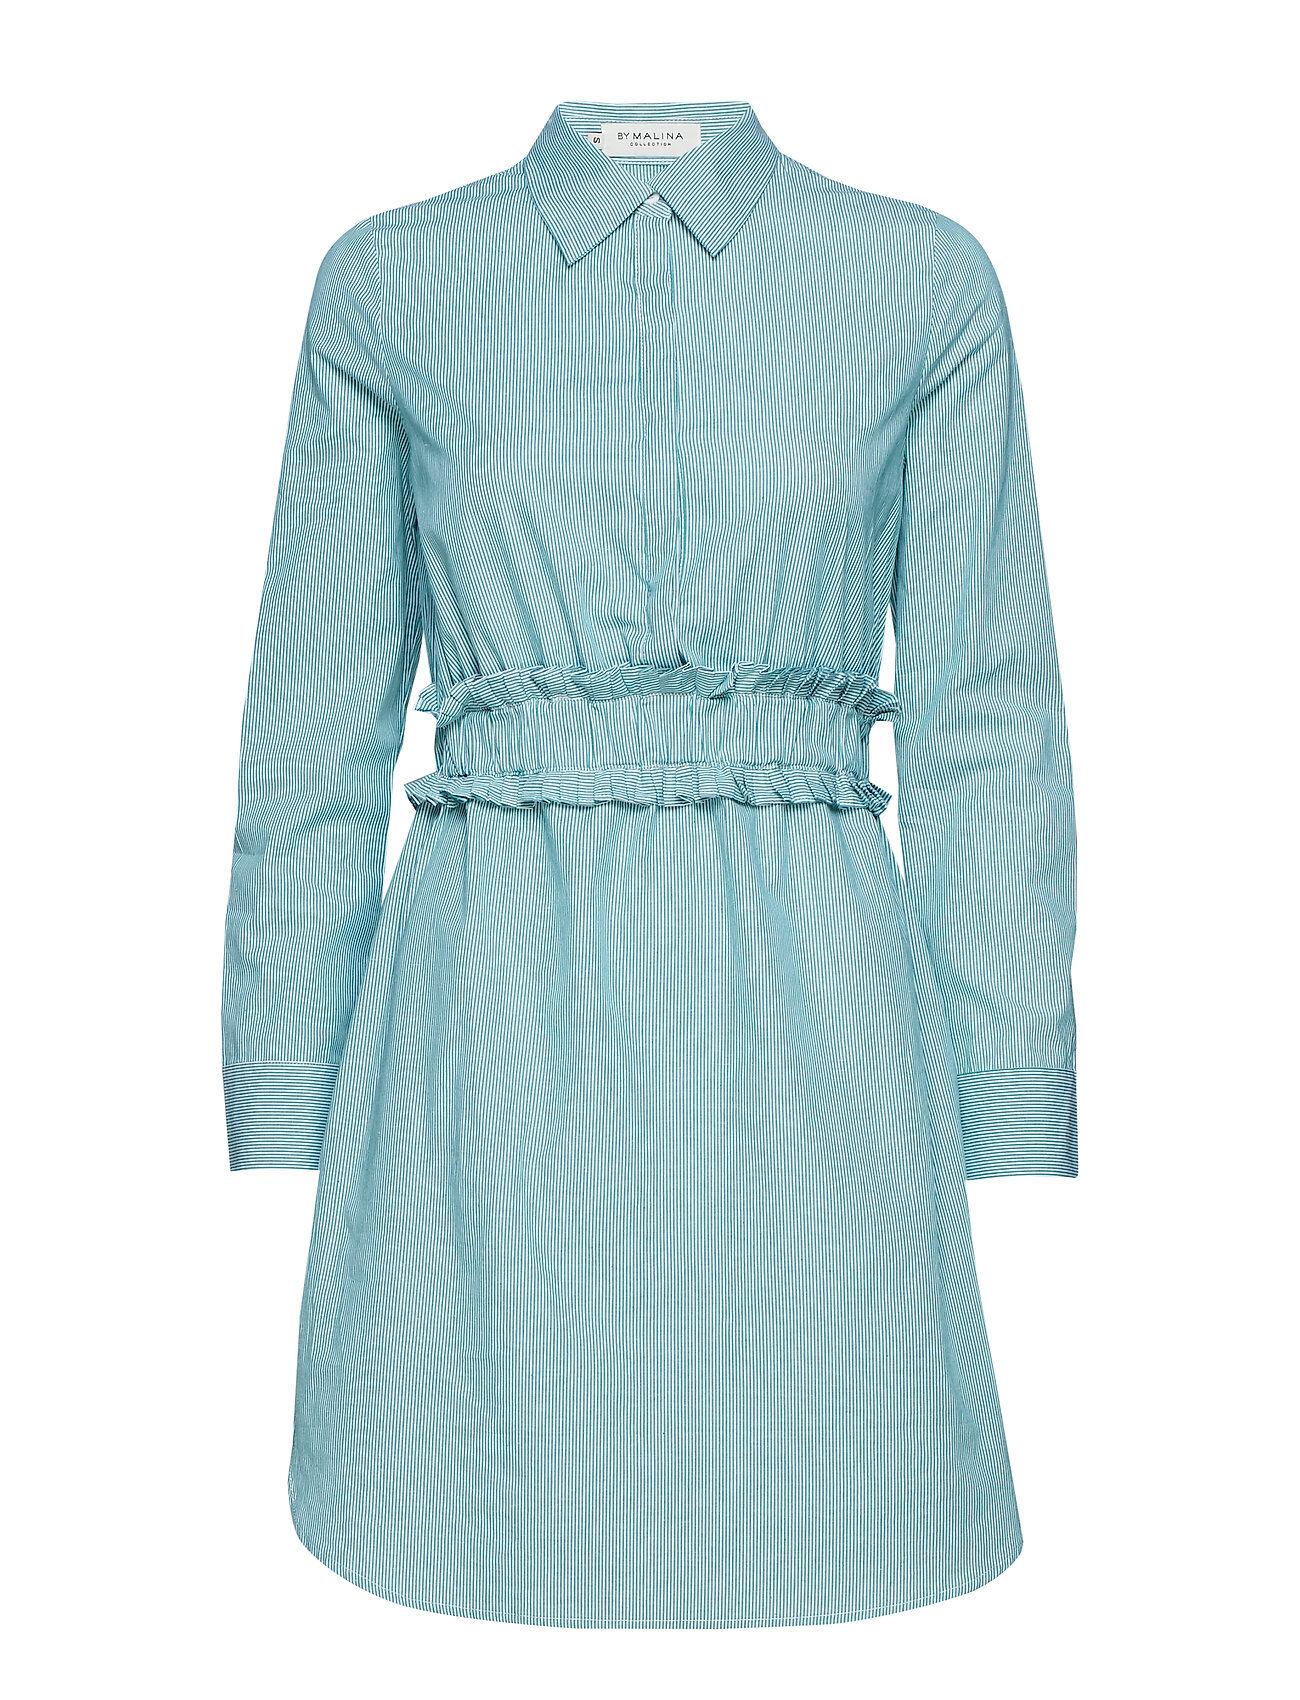 By Malina Saana Shirt Dress Lyhyt Mekko Sininen By Malina